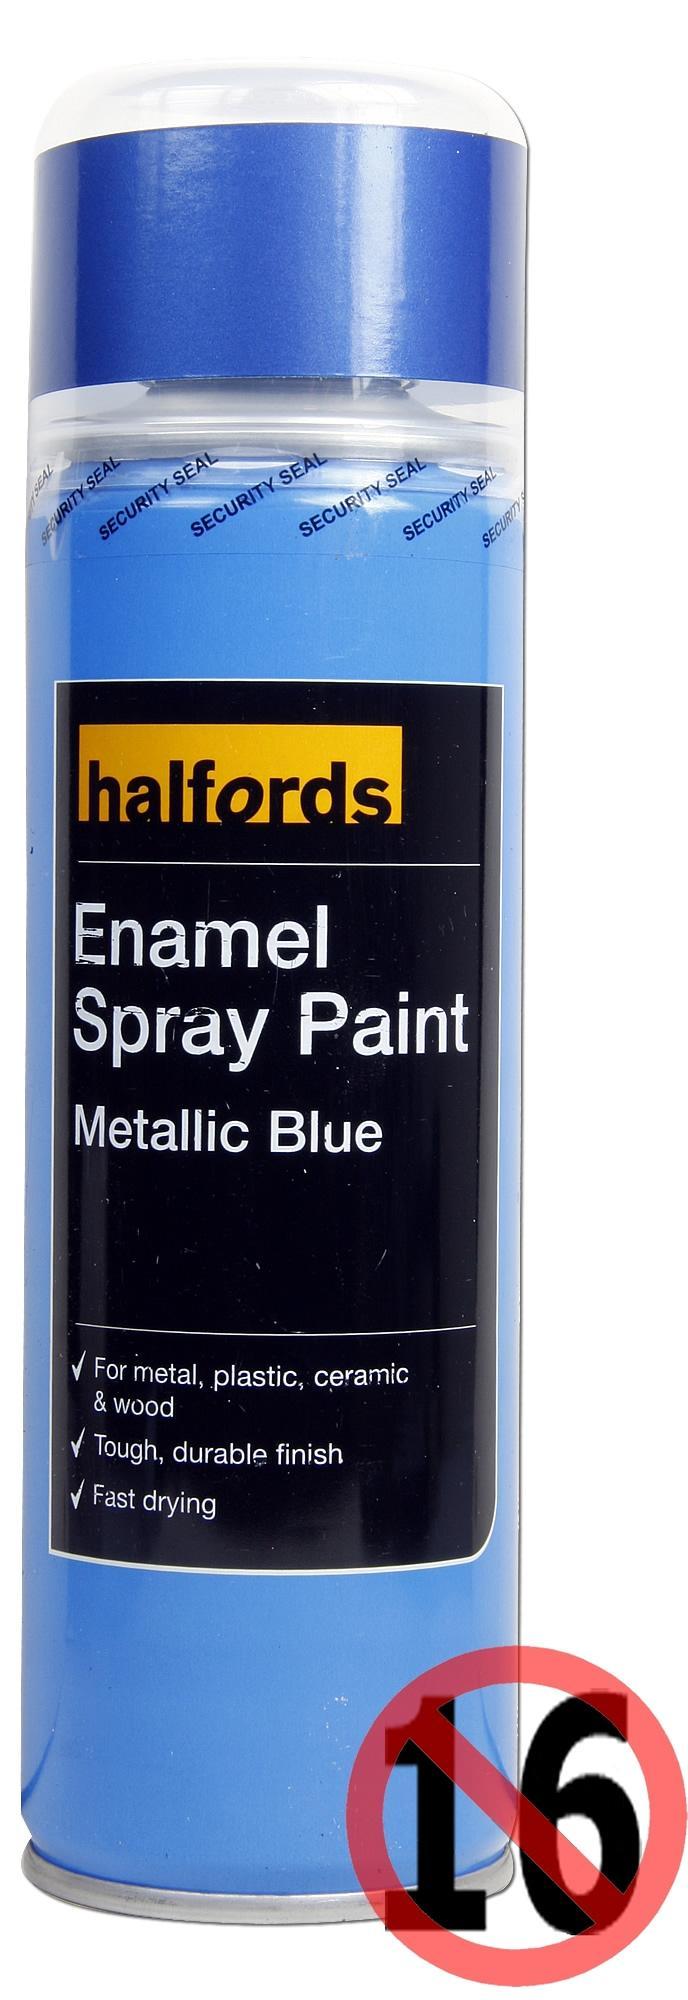 halfords enamel spray paint metalli rh halfords com Metal Paint Guide Spray- Paint Guide